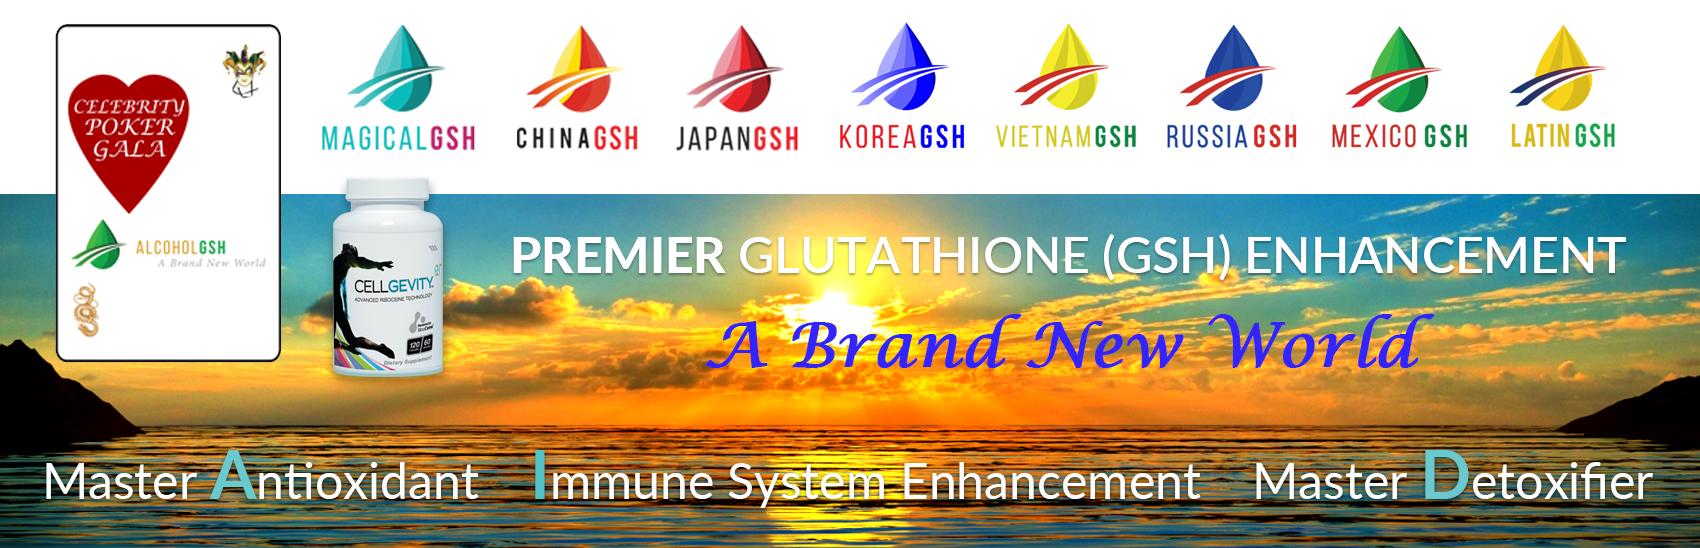 Master Antioxidant, Immune System, Master Detoxifier